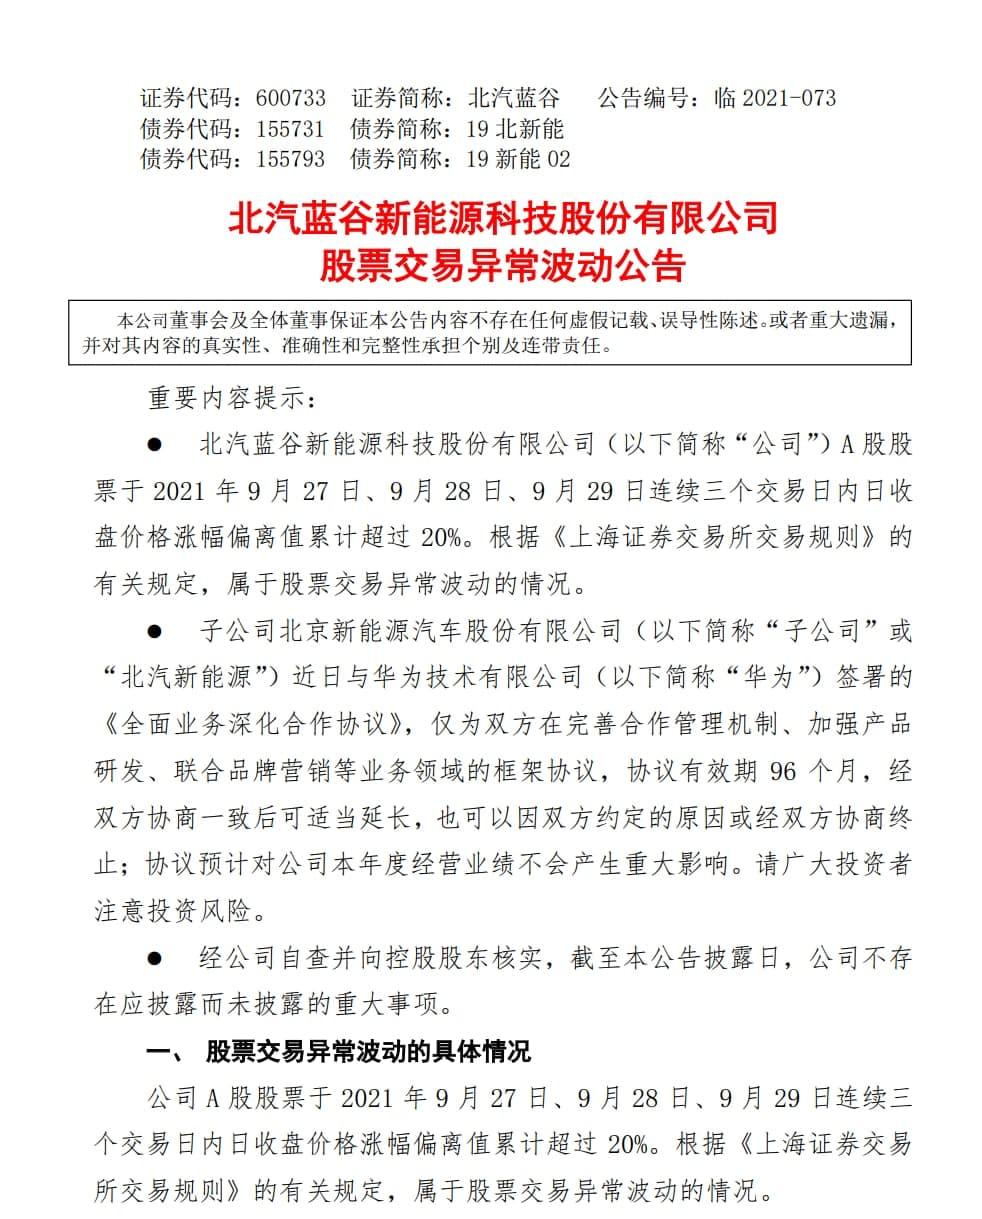 Huawei BAIC New Energy share disclosure